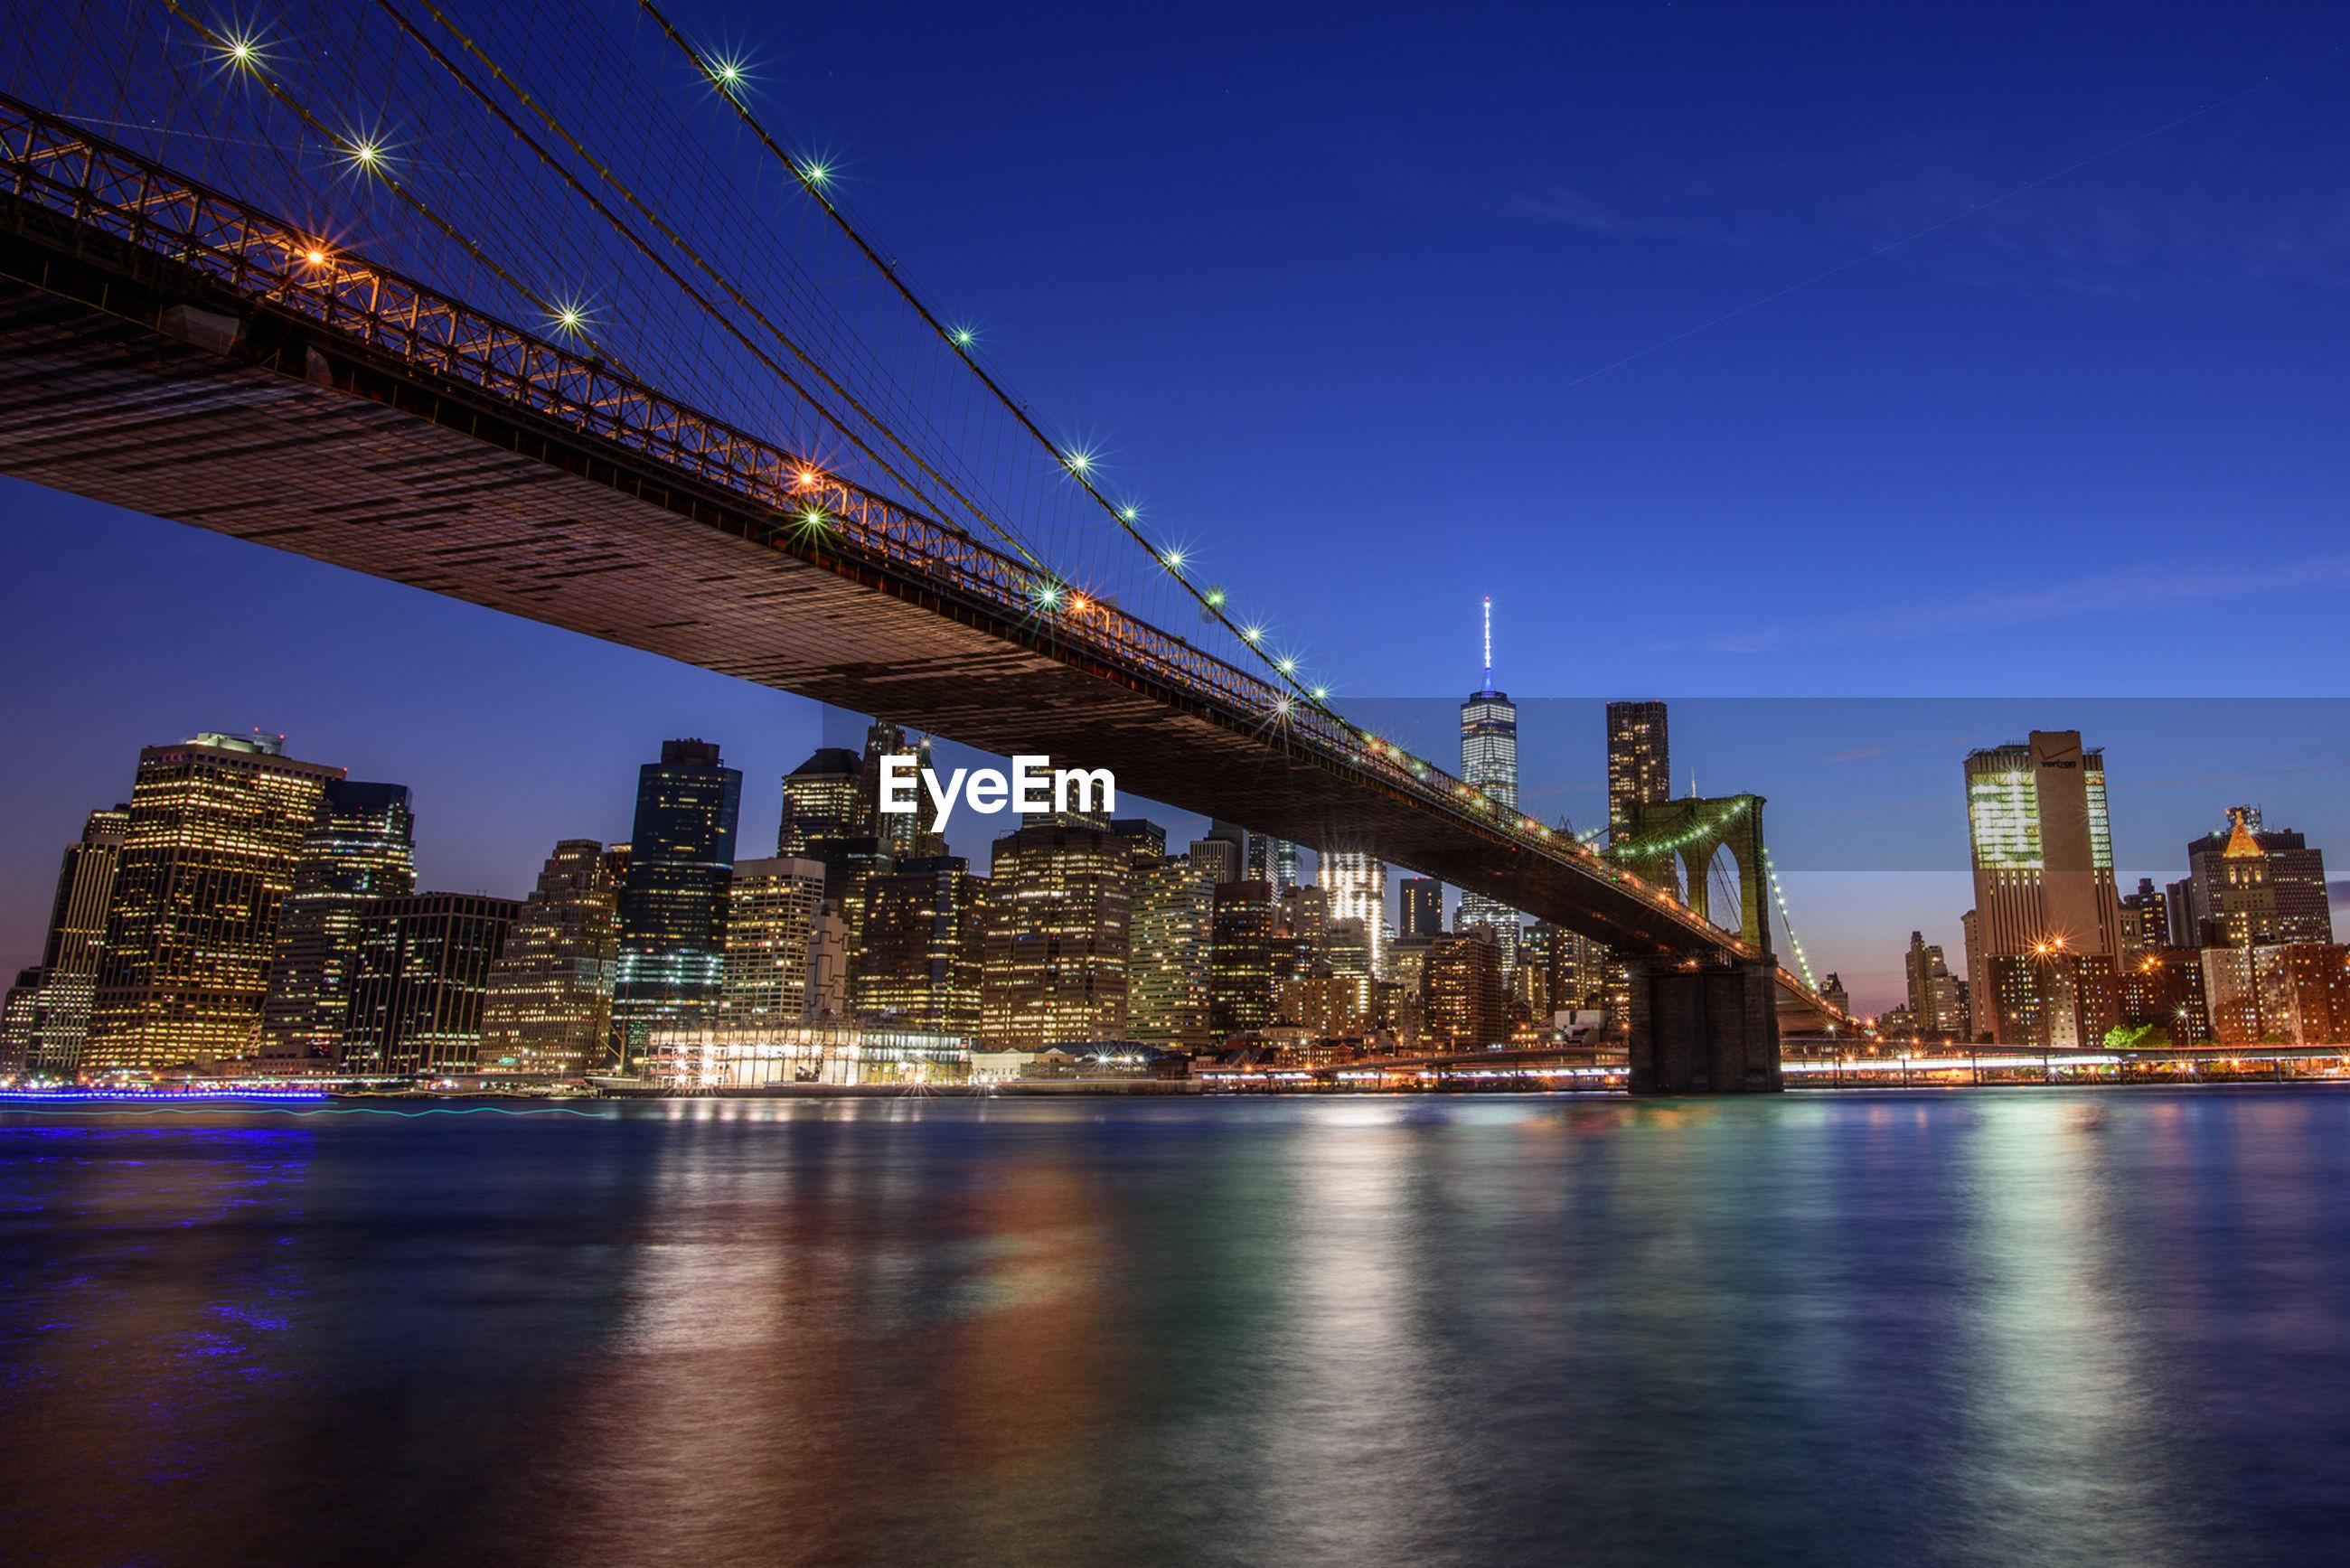 Illuminated brooklyn bridge over east river against sky